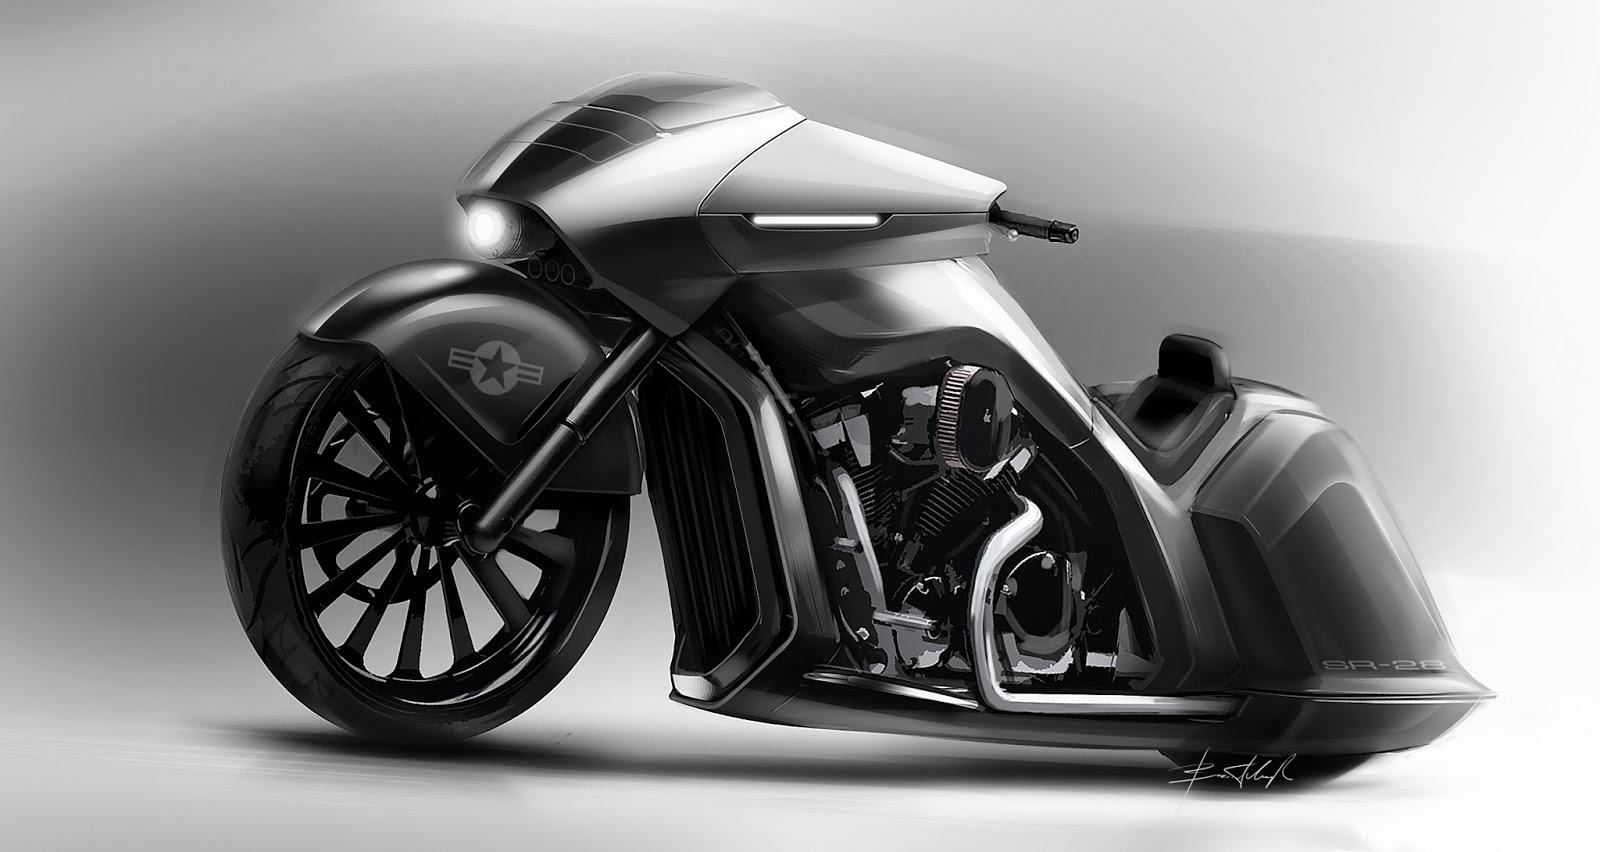 hight resolution of sr 28 custom motorcycle based on honda vtx 1800